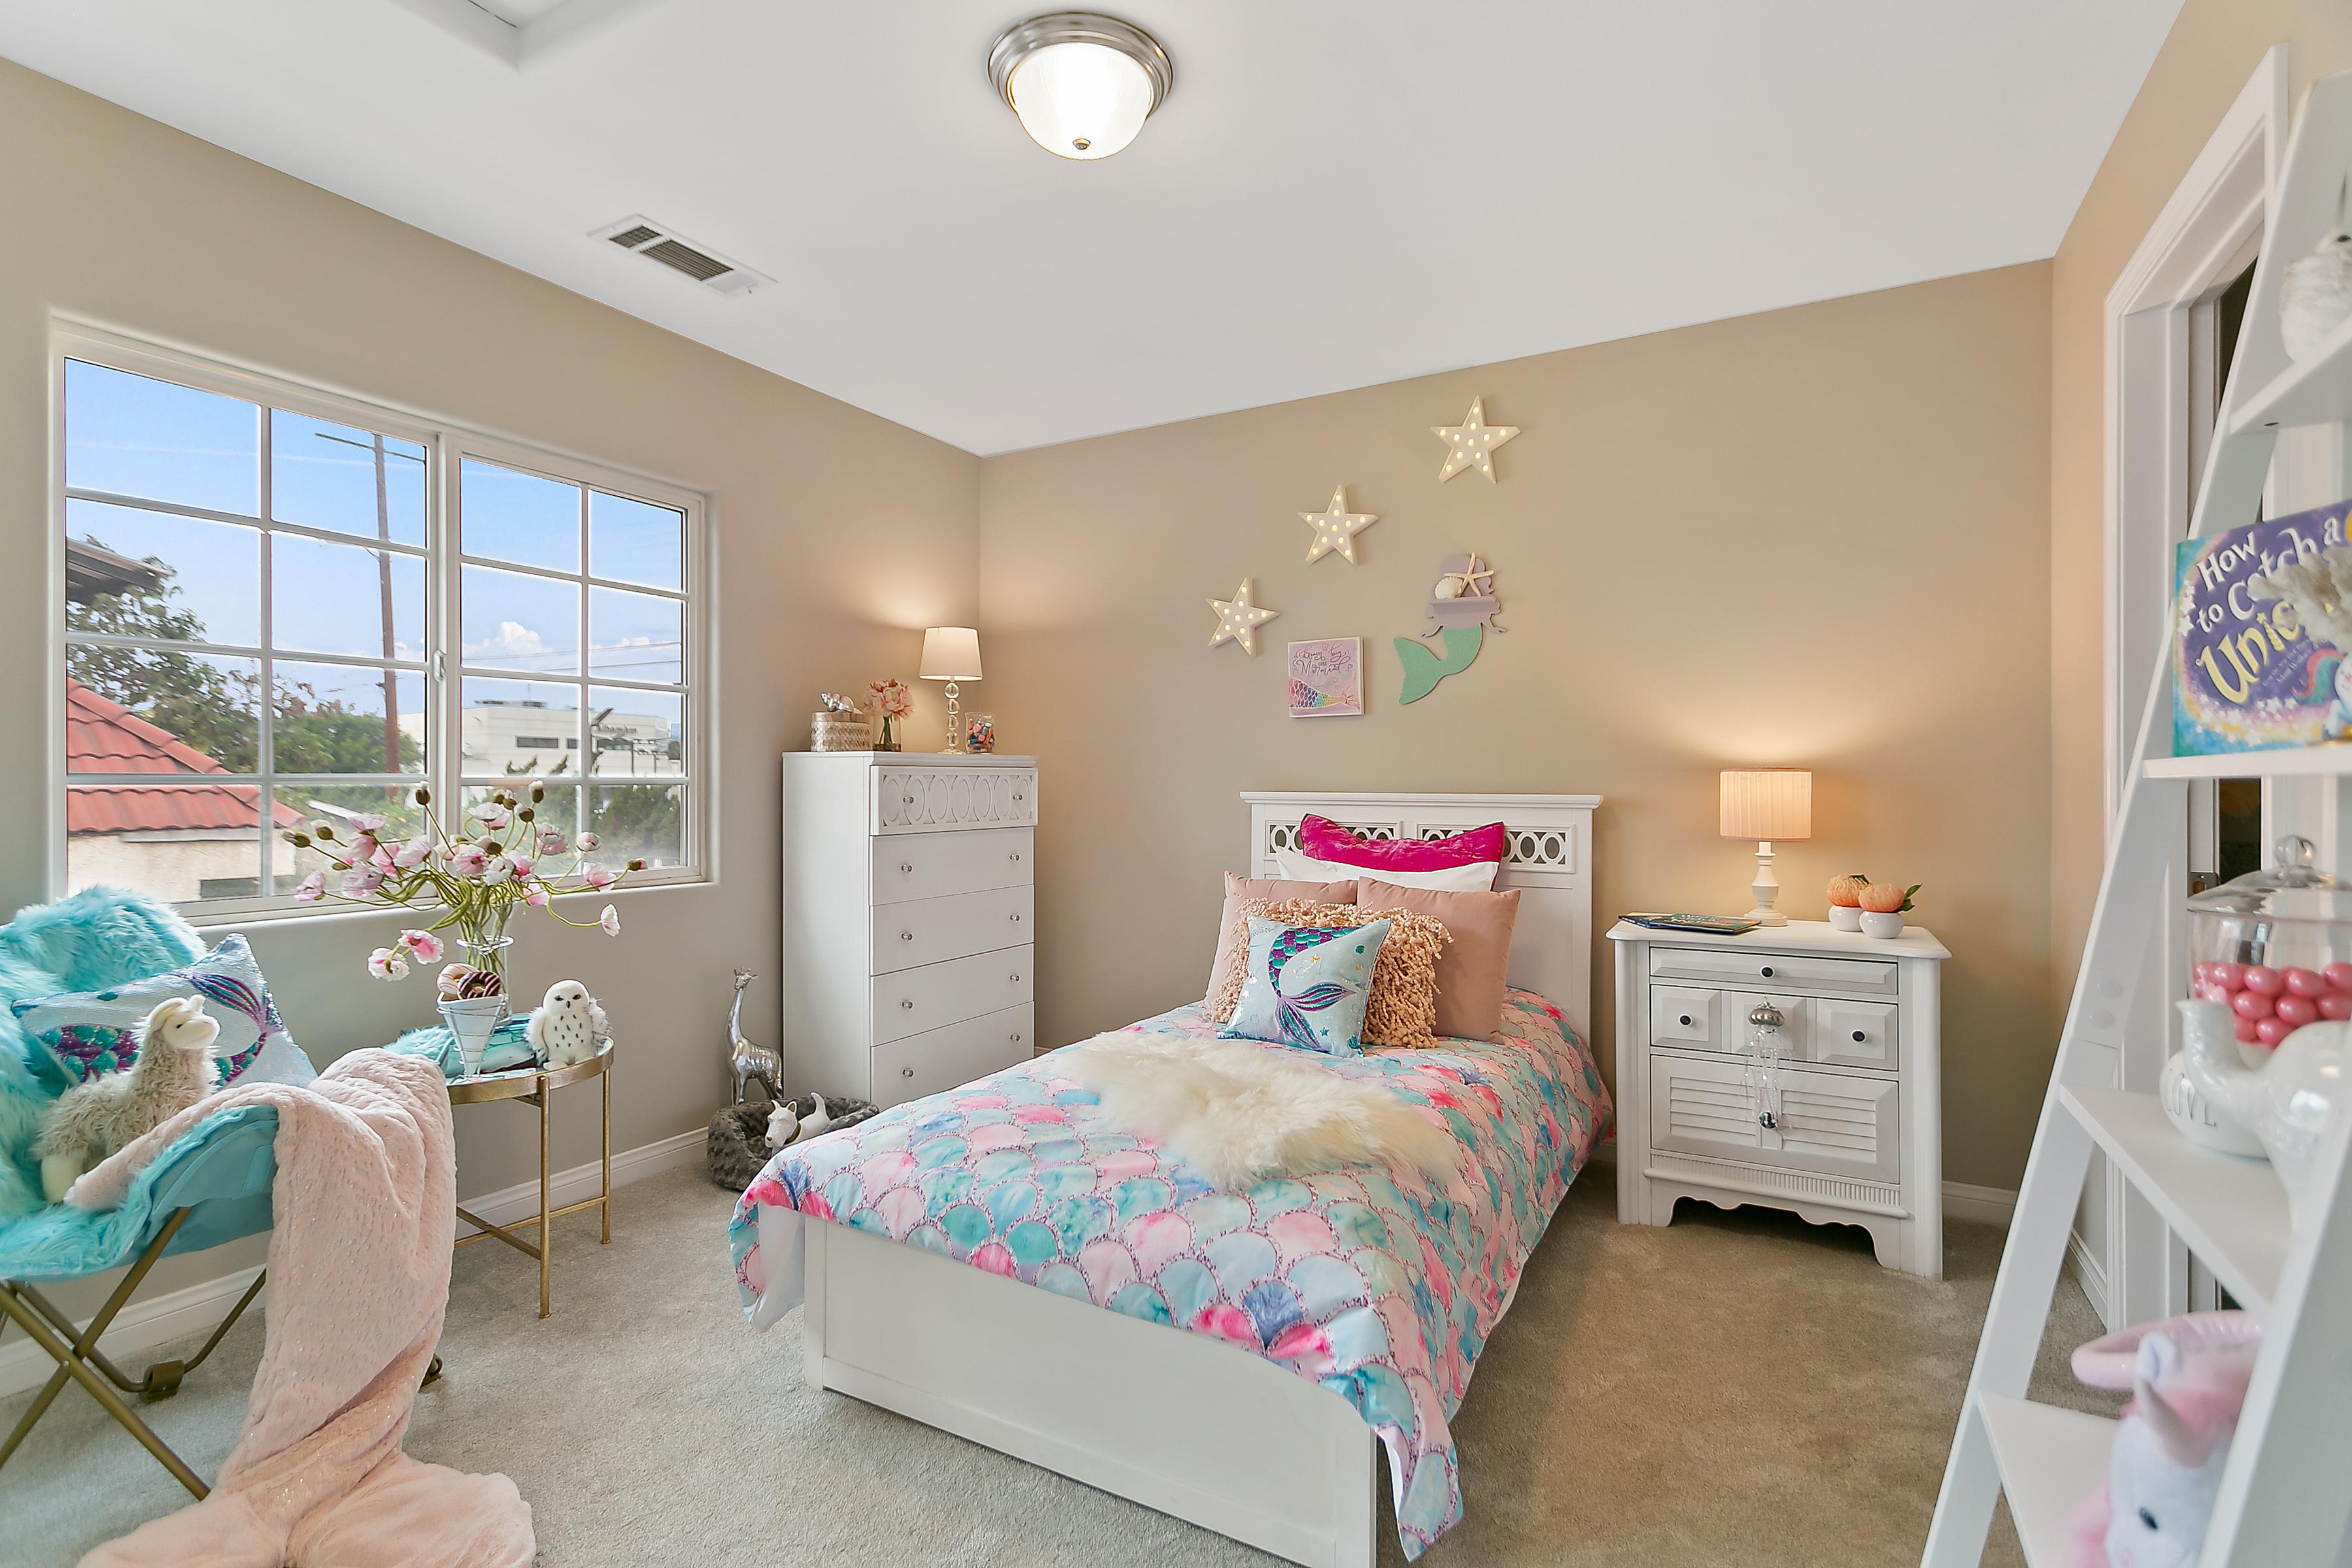 Mermaid Bedroom Decor Ideas CIndy Dole S